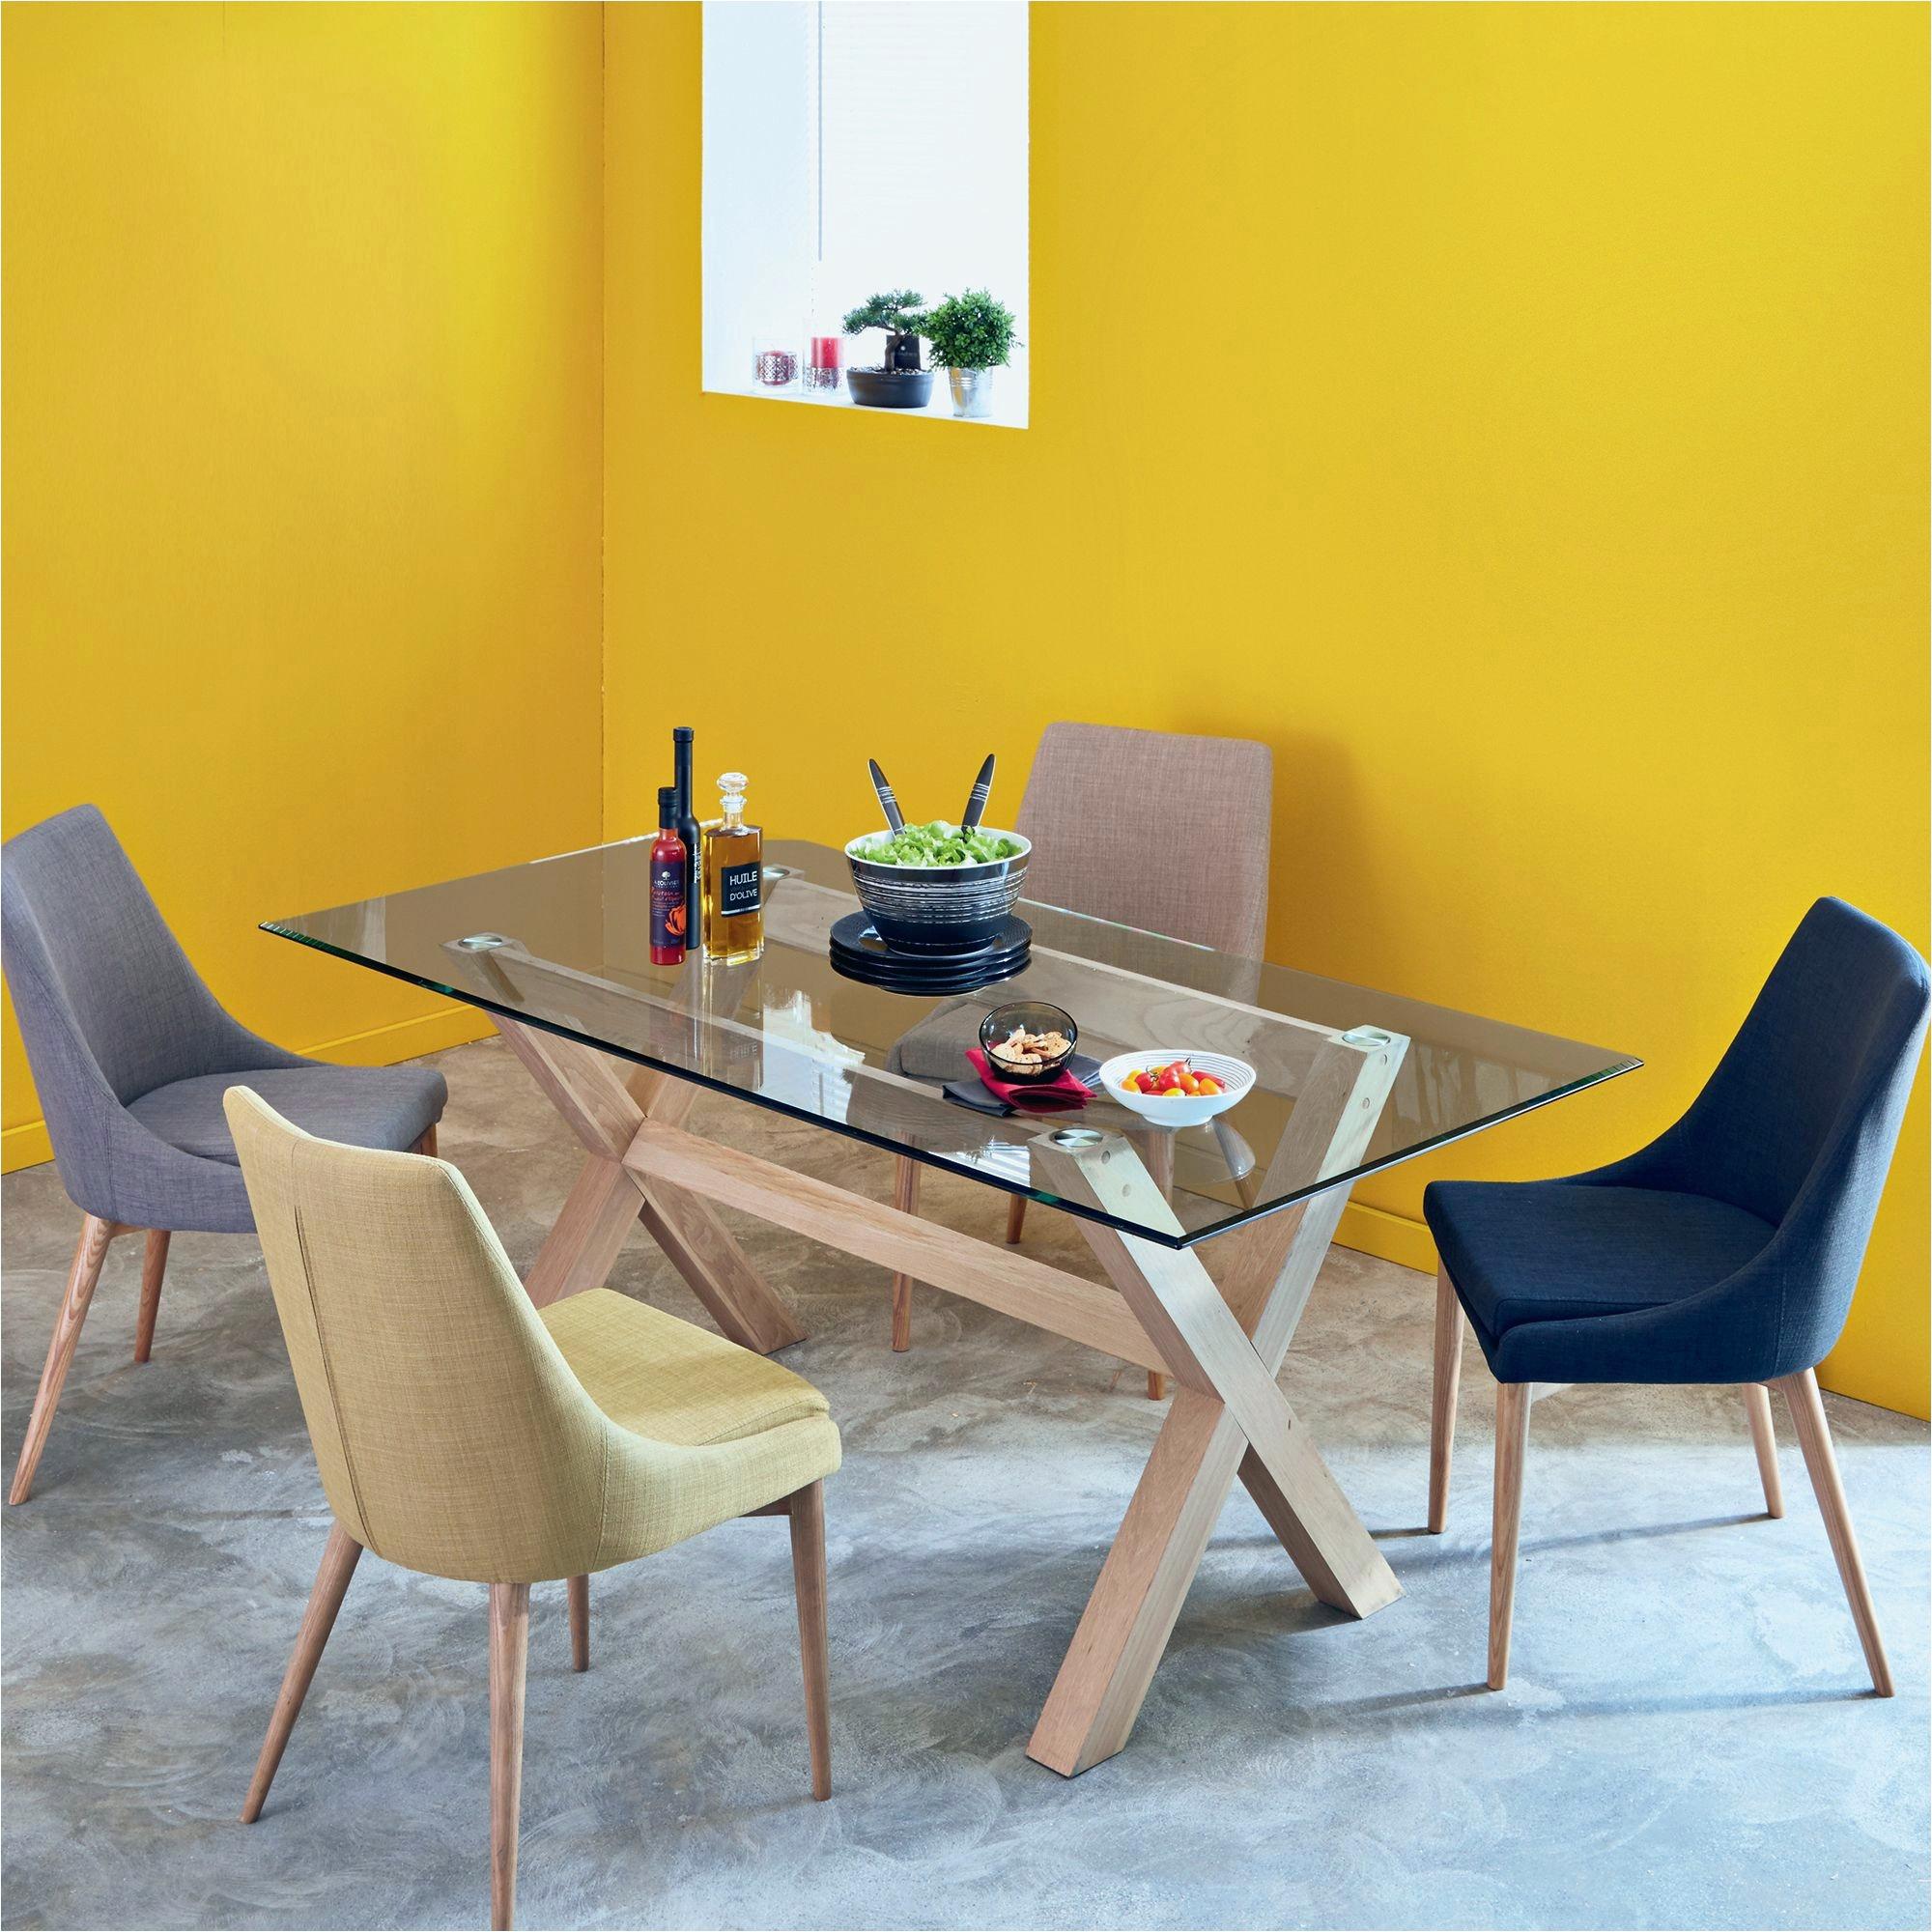 table pliante pas cher carrefour inspirant photos. Black Bedroom Furniture Sets. Home Design Ideas